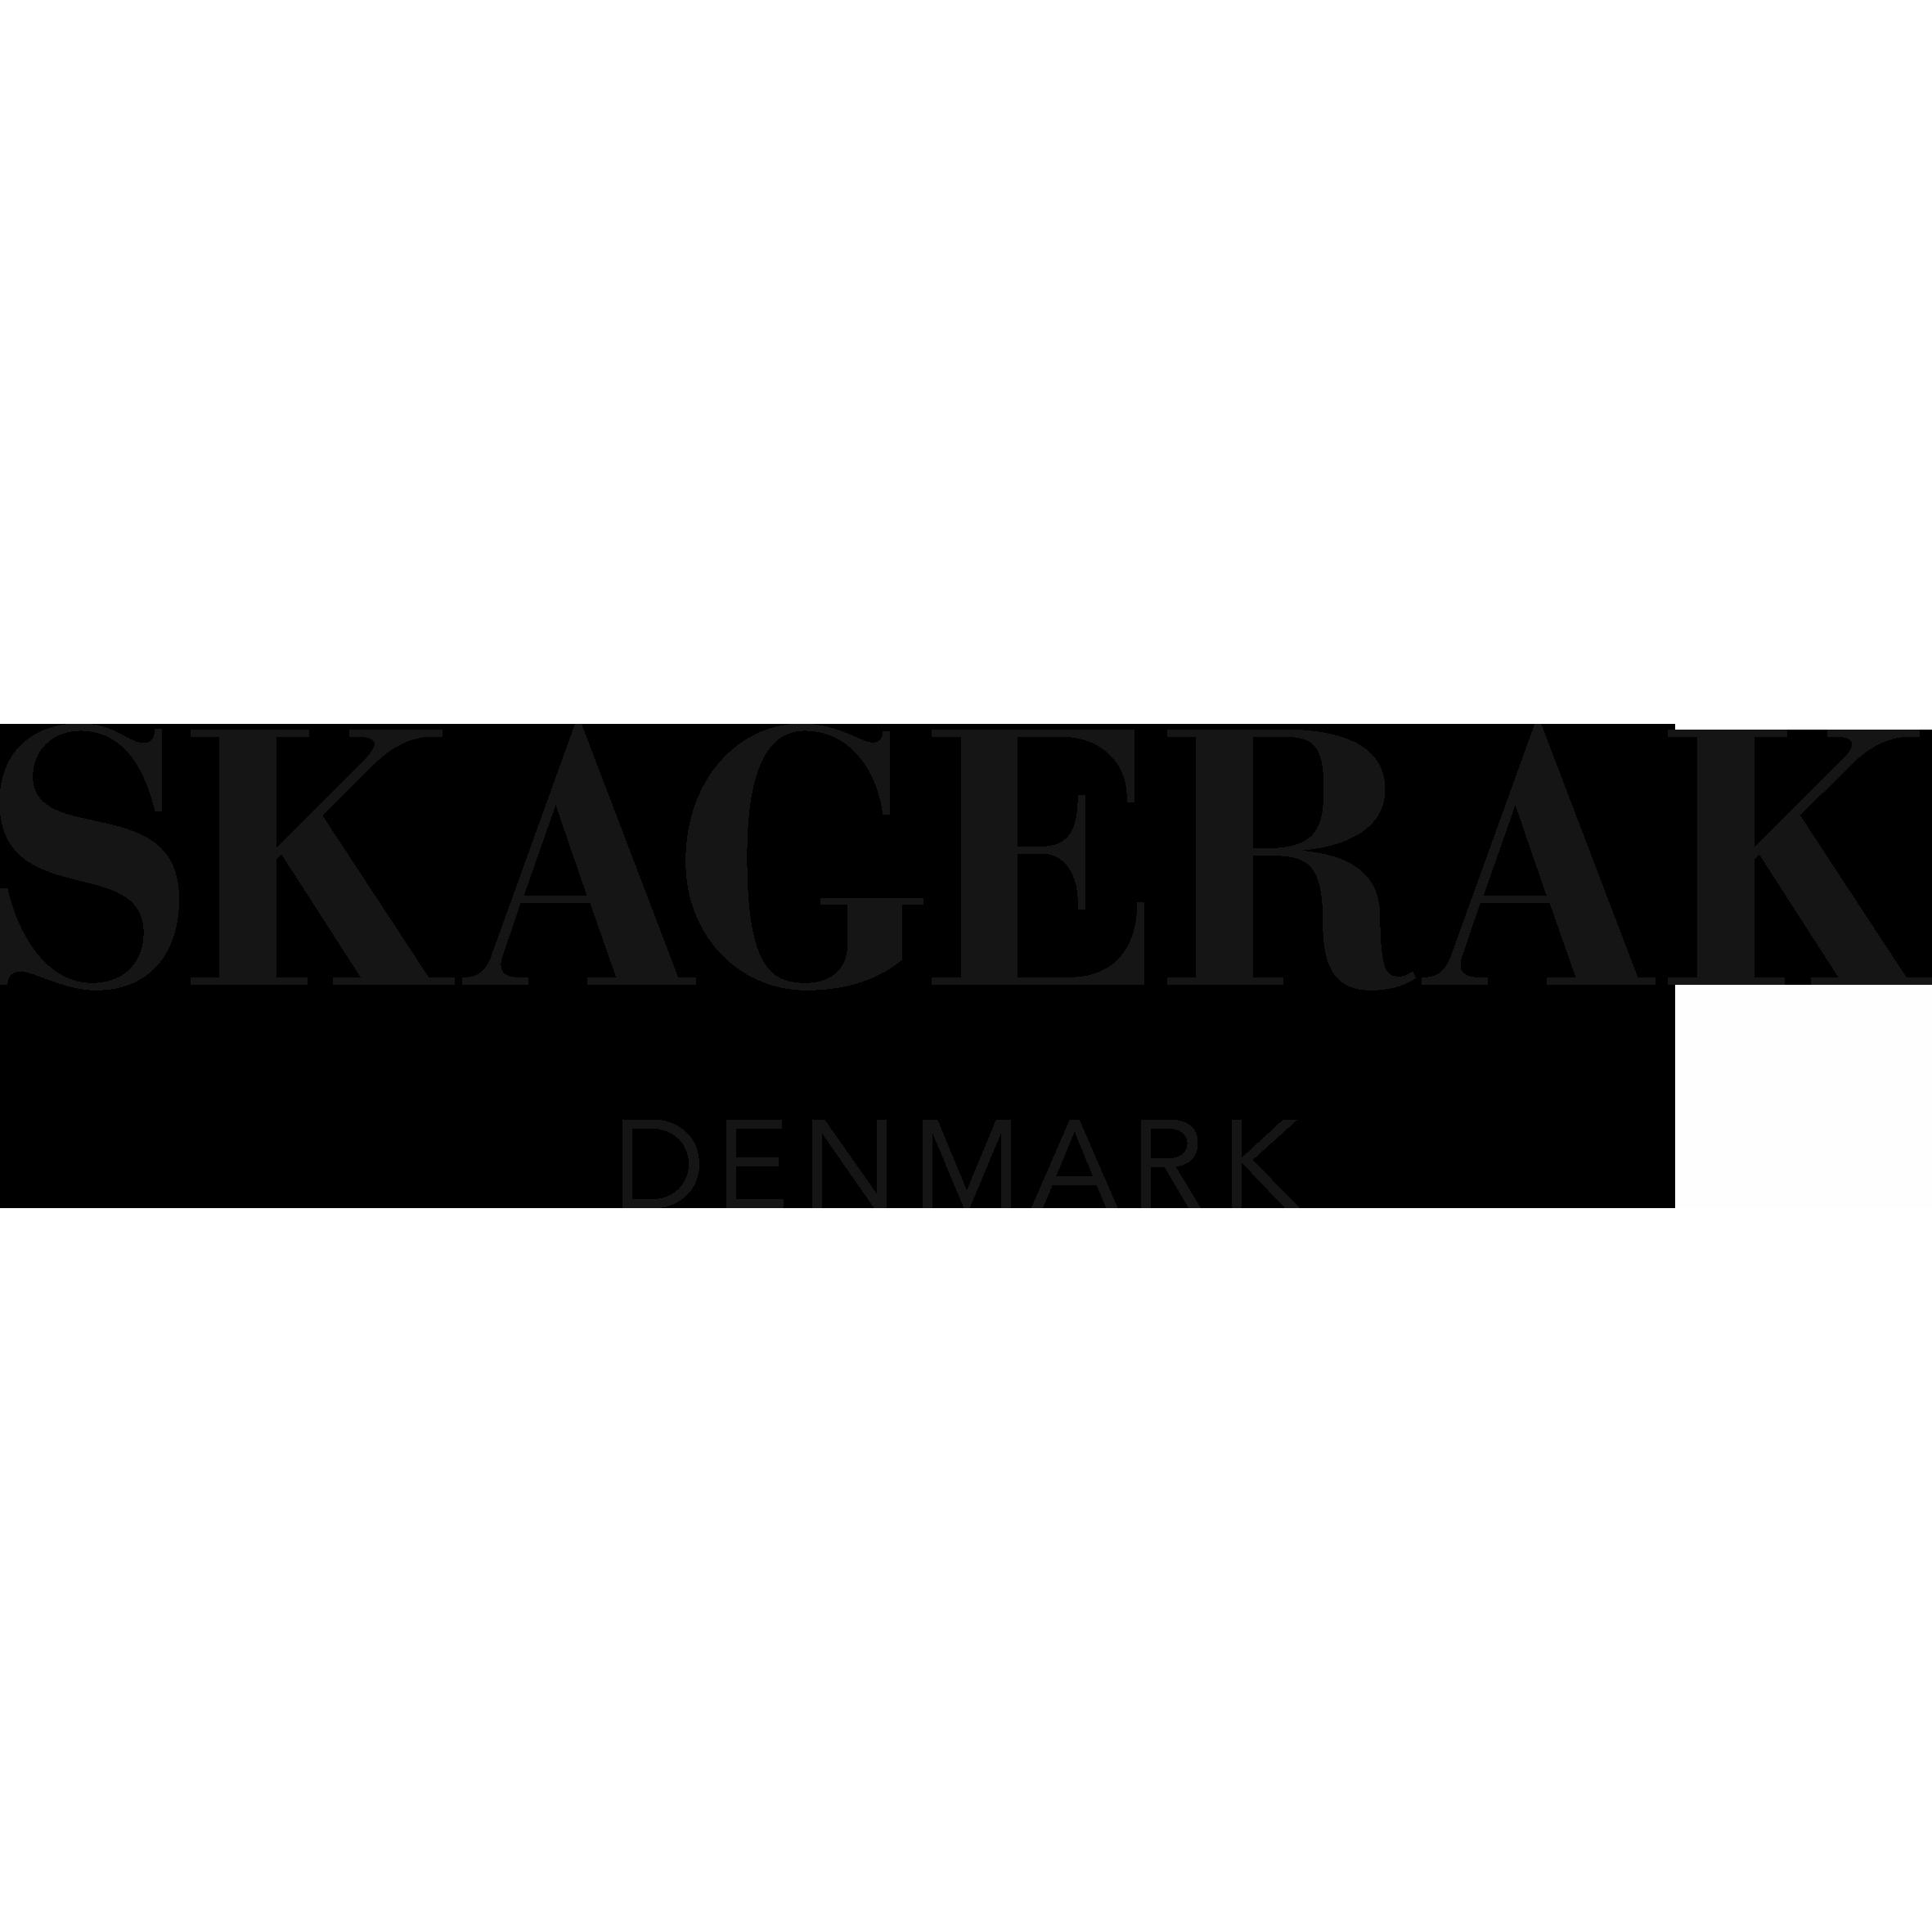 SKAGERAK